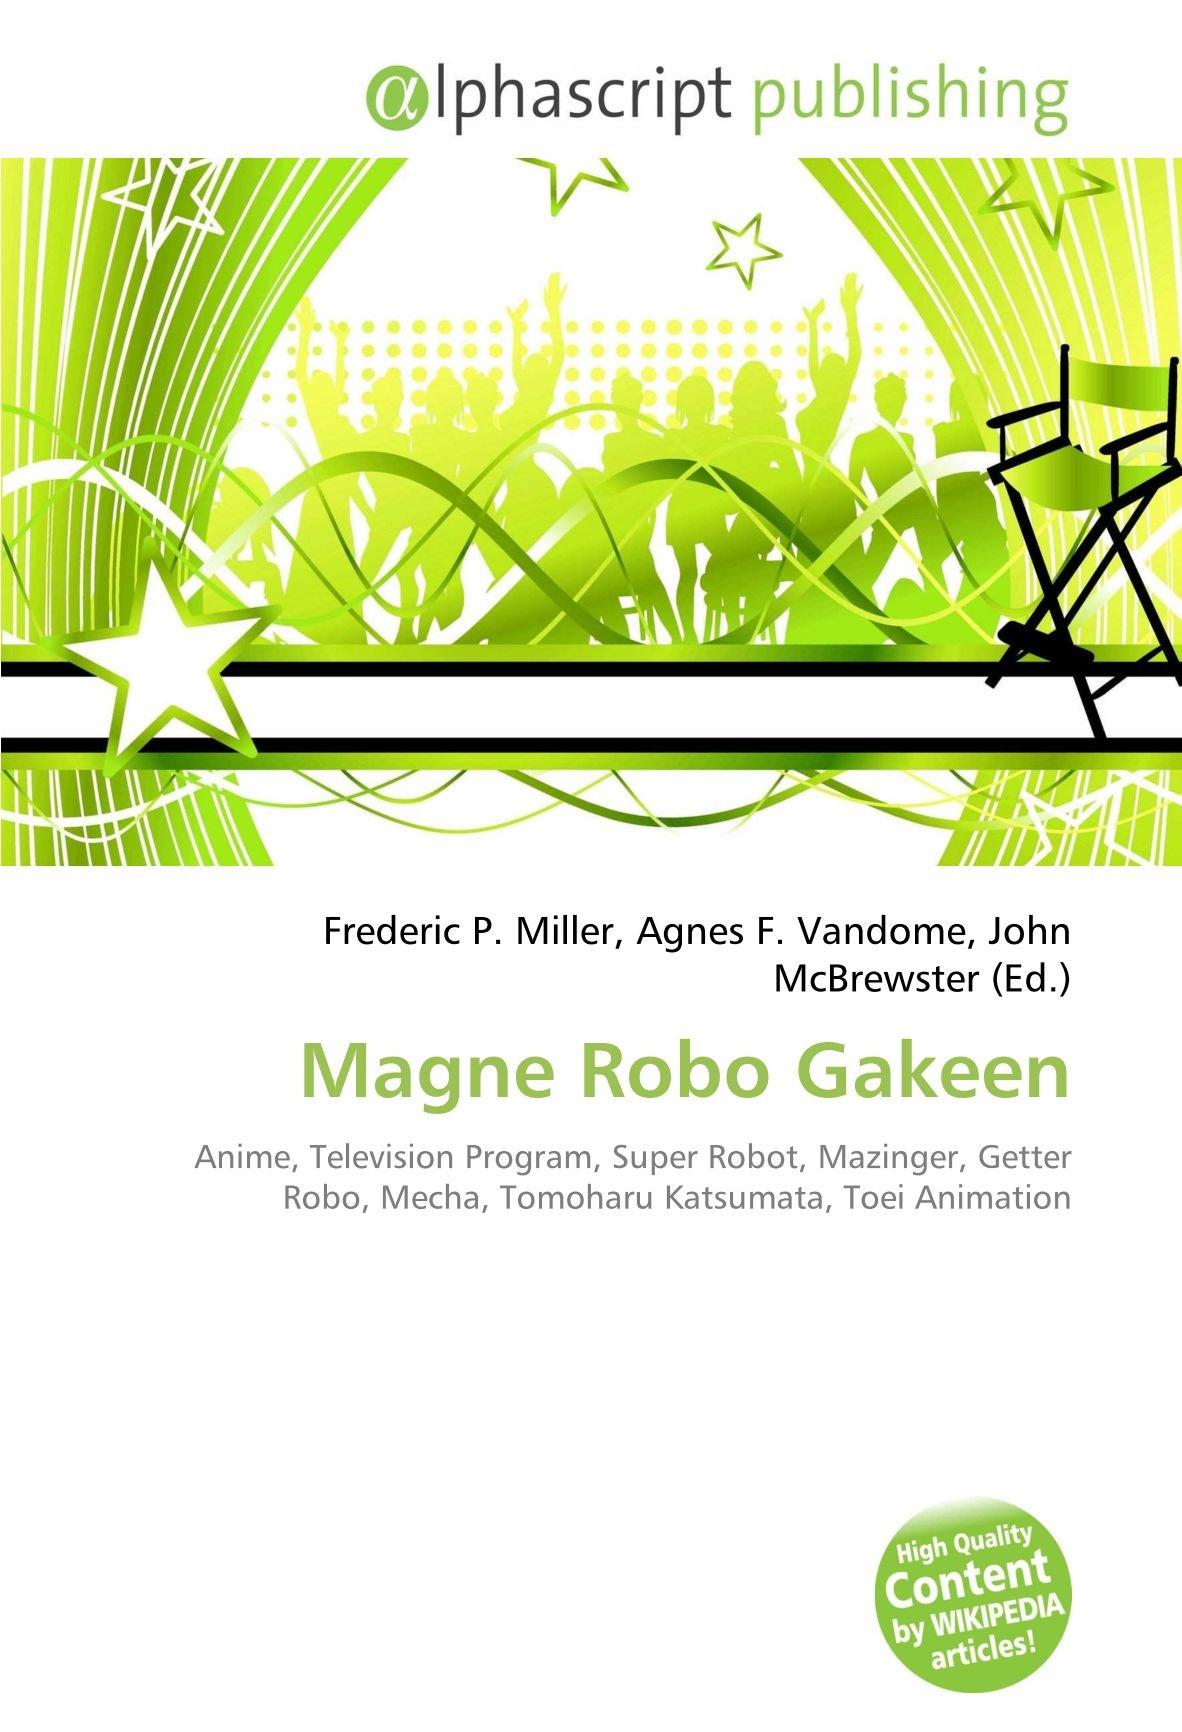 Magne Robo Gakeen: Anime, Television Program, Super Robot, Mazinger, Getter Robo, Mecha, Tomoharu Katsumata, Toei Animation: Amazon.es: Miller, Frederic P., Vandome, Agnes F., McBrewster, John: Libros en idiomas extranjeros